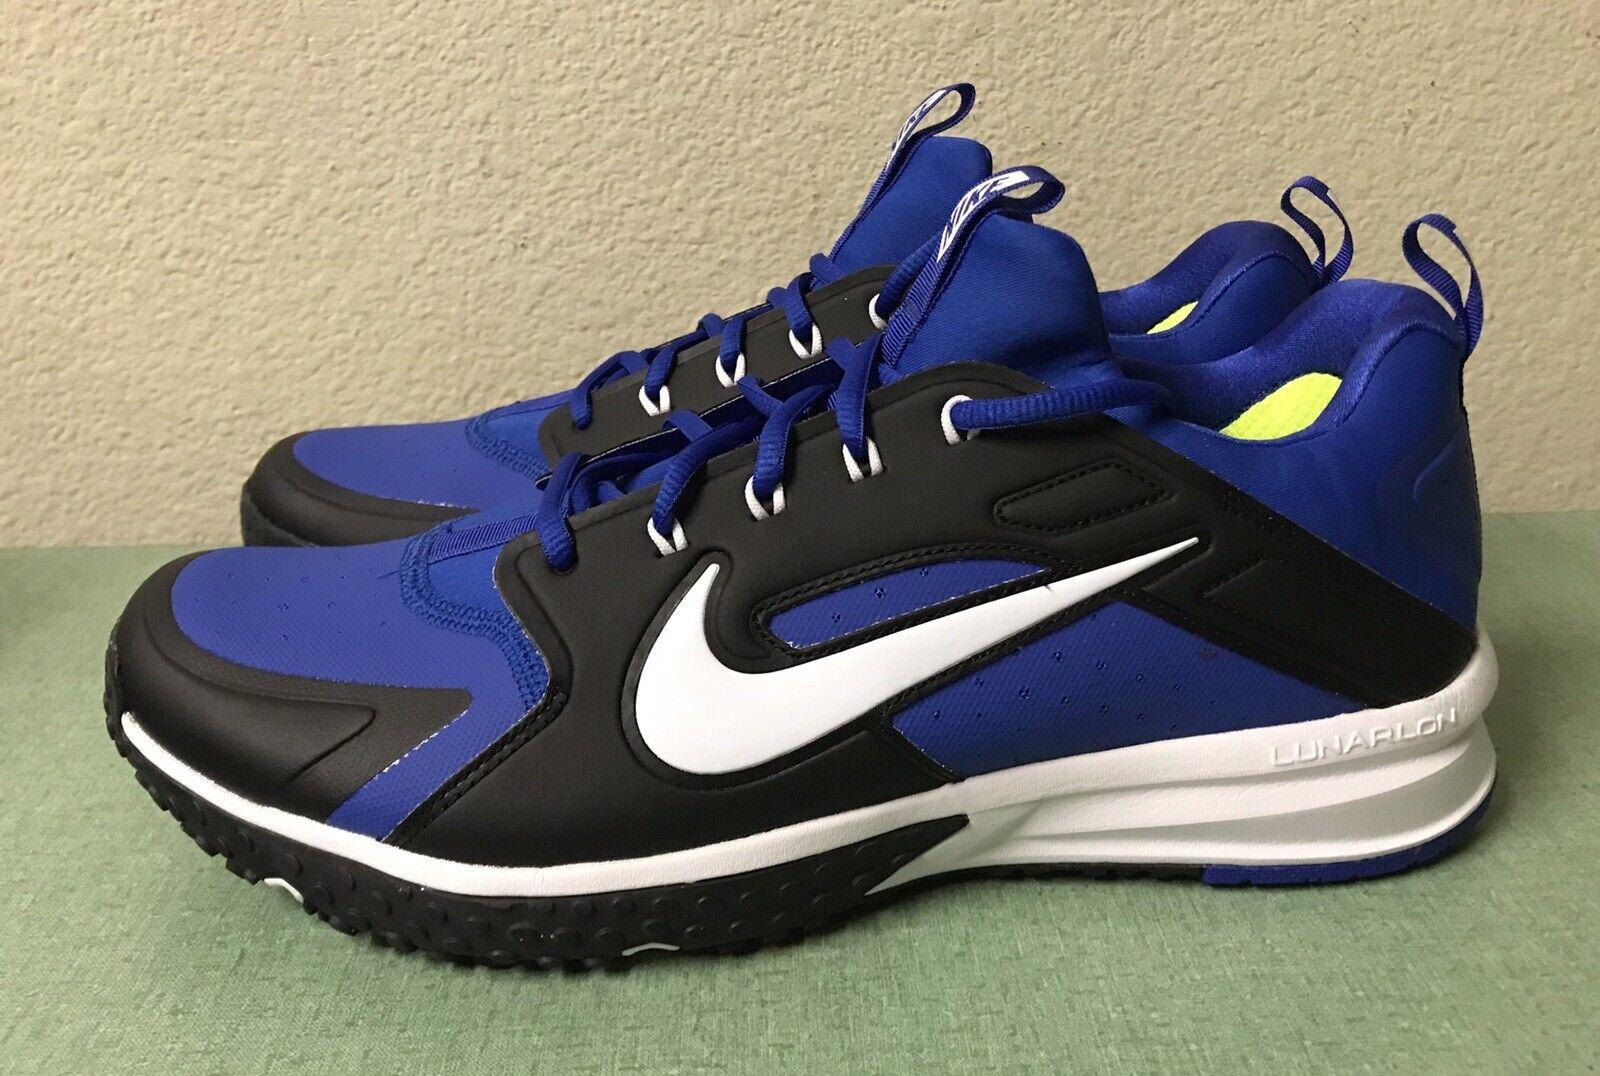 Nike Alpha Huarache Huarache Huarache Turf Turf blu nero bianca Baseball Lacrosse Uomo Sz 12 NEW  a6e881